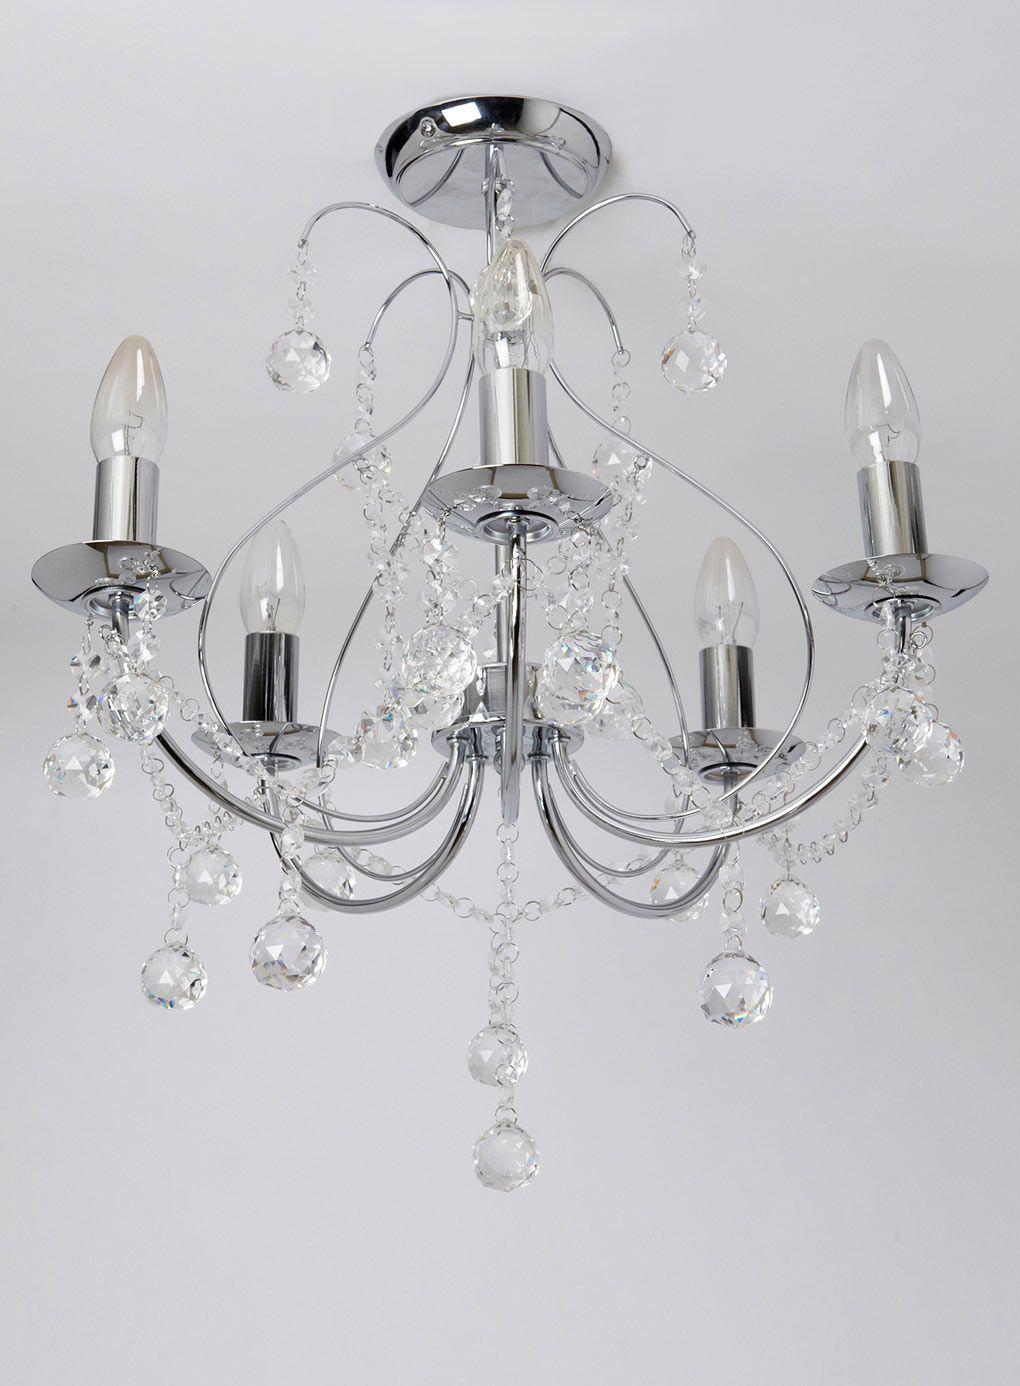 Sapparia 5 light flush chandelier bhs living room pinterest sapparia 5 light flush chandelier bhs mozeypictures Choice Image